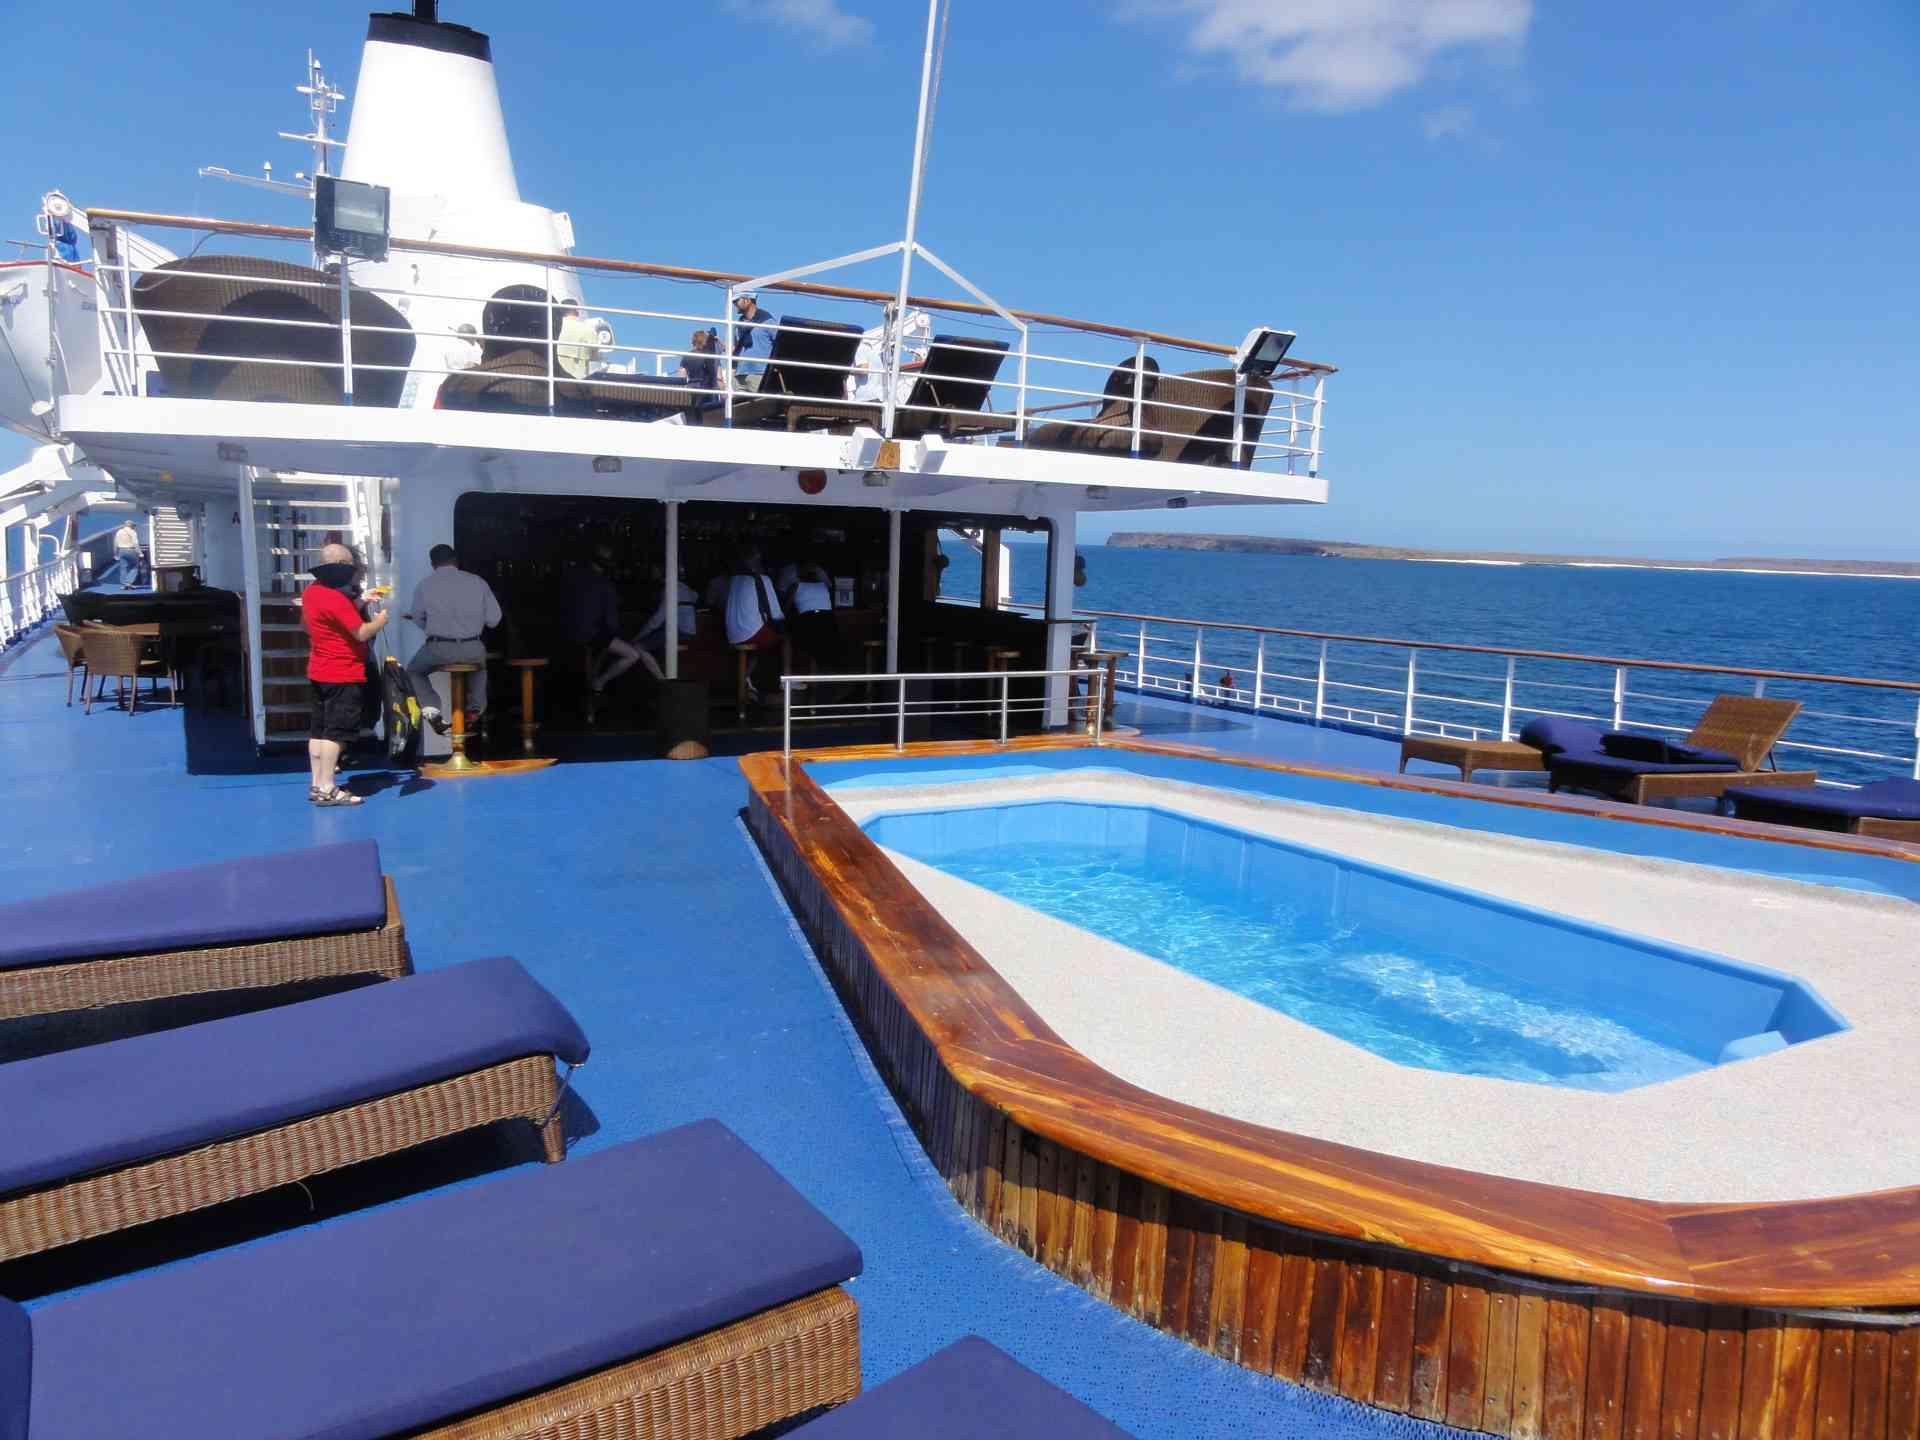 The pool & sun terrace on board the Galapagos Legend, Ecuador by Jeremy van Heerde